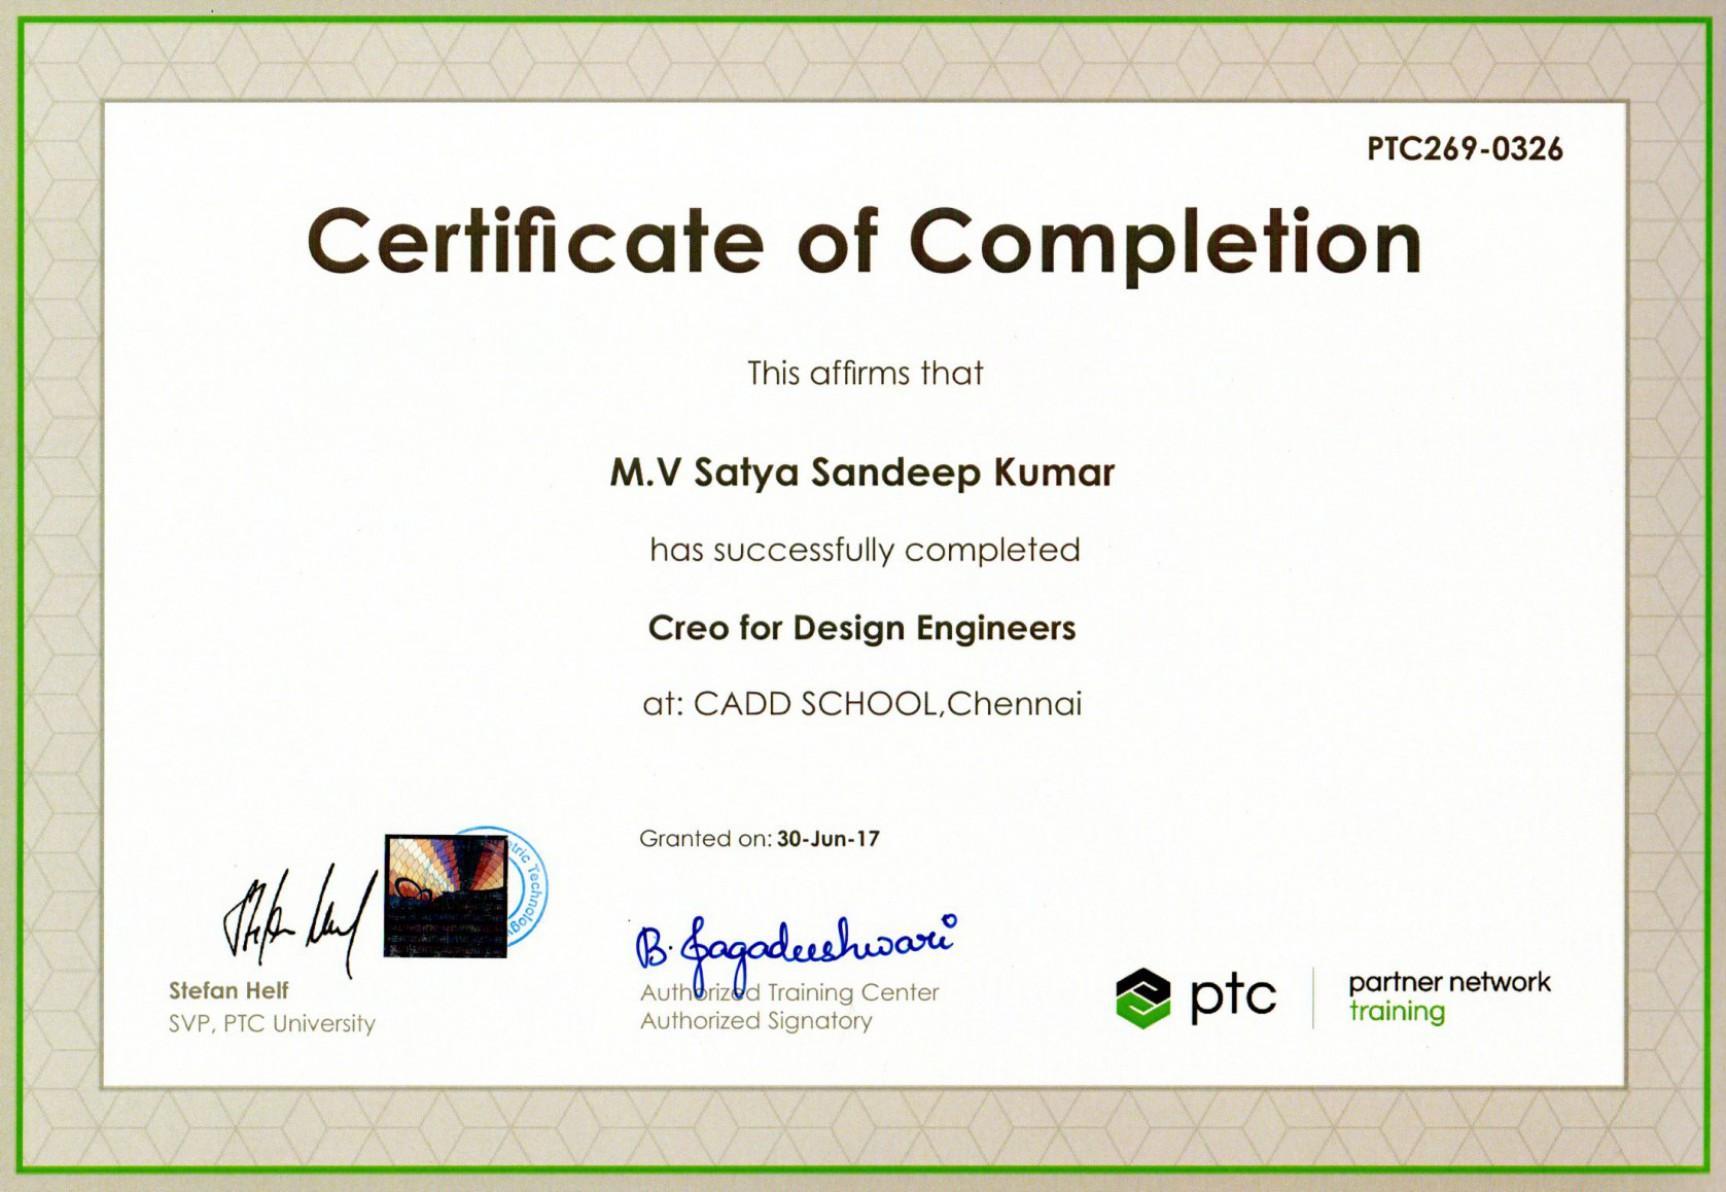 ptc international certificate certification training creo cad certifications follow cadd